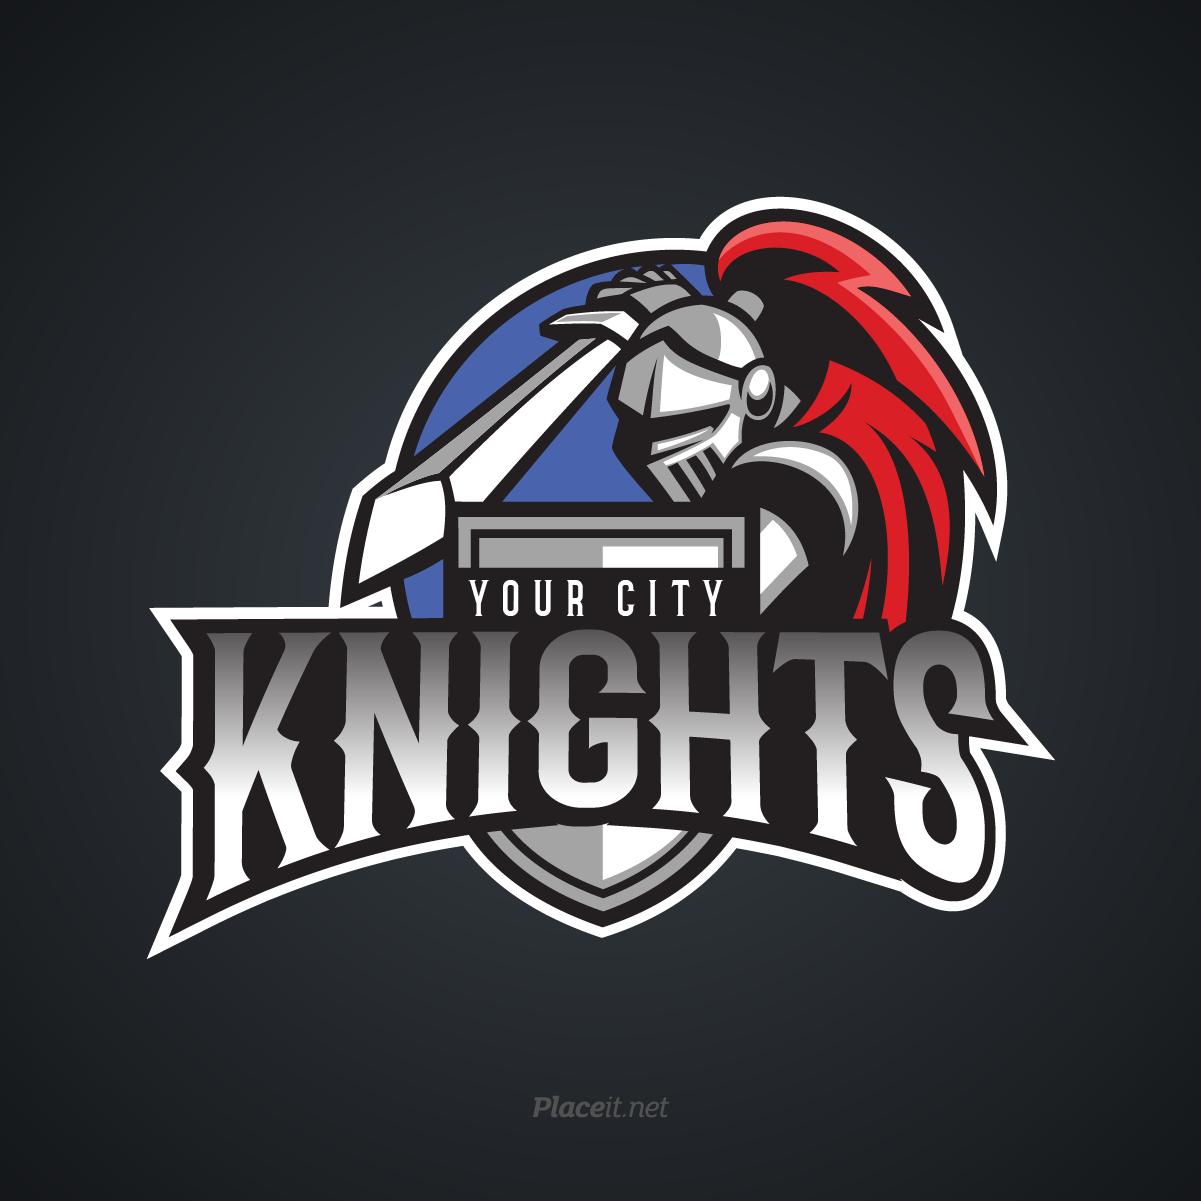 Knights sports logo